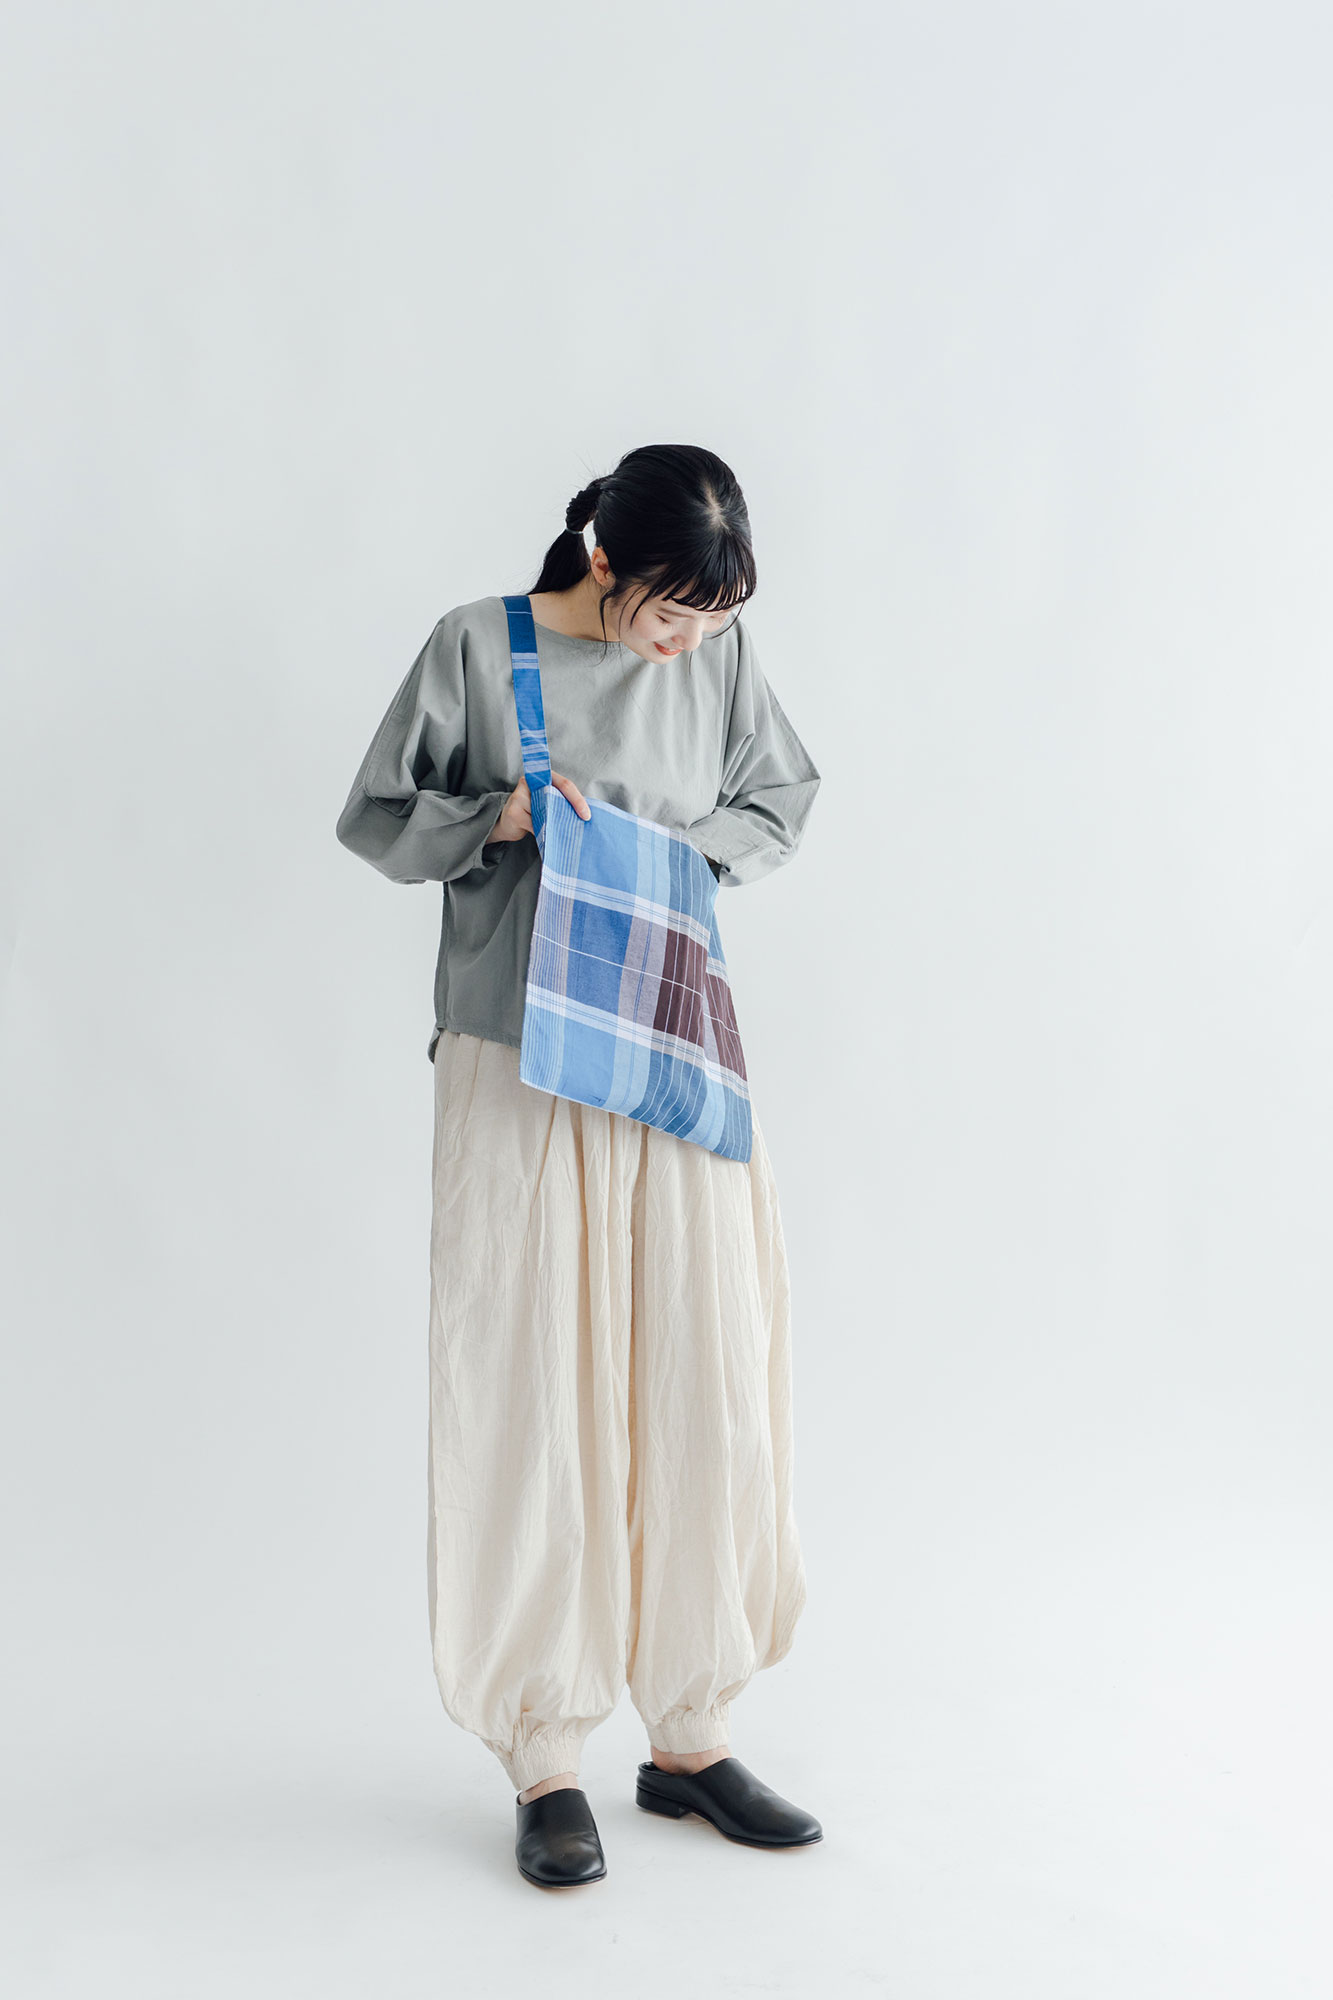 miiThaaii ヴァサント ワンハンドルトート(カラーアソート)